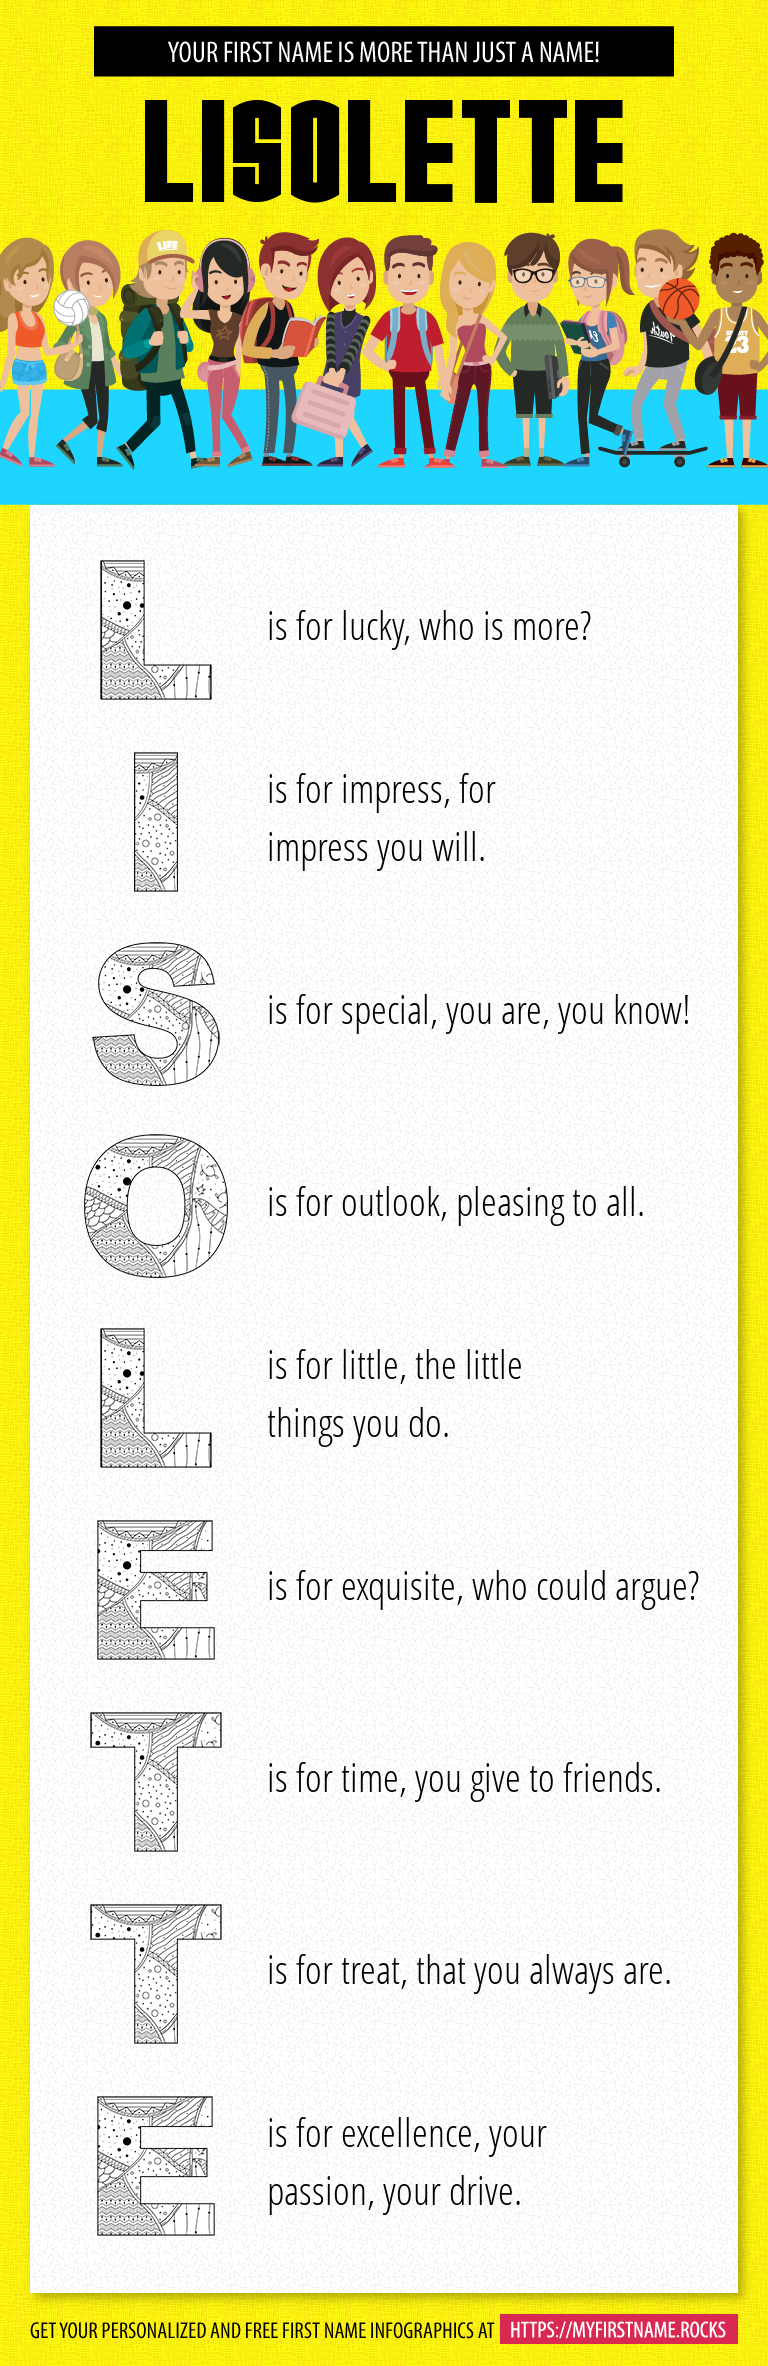 Lisolette Infographics